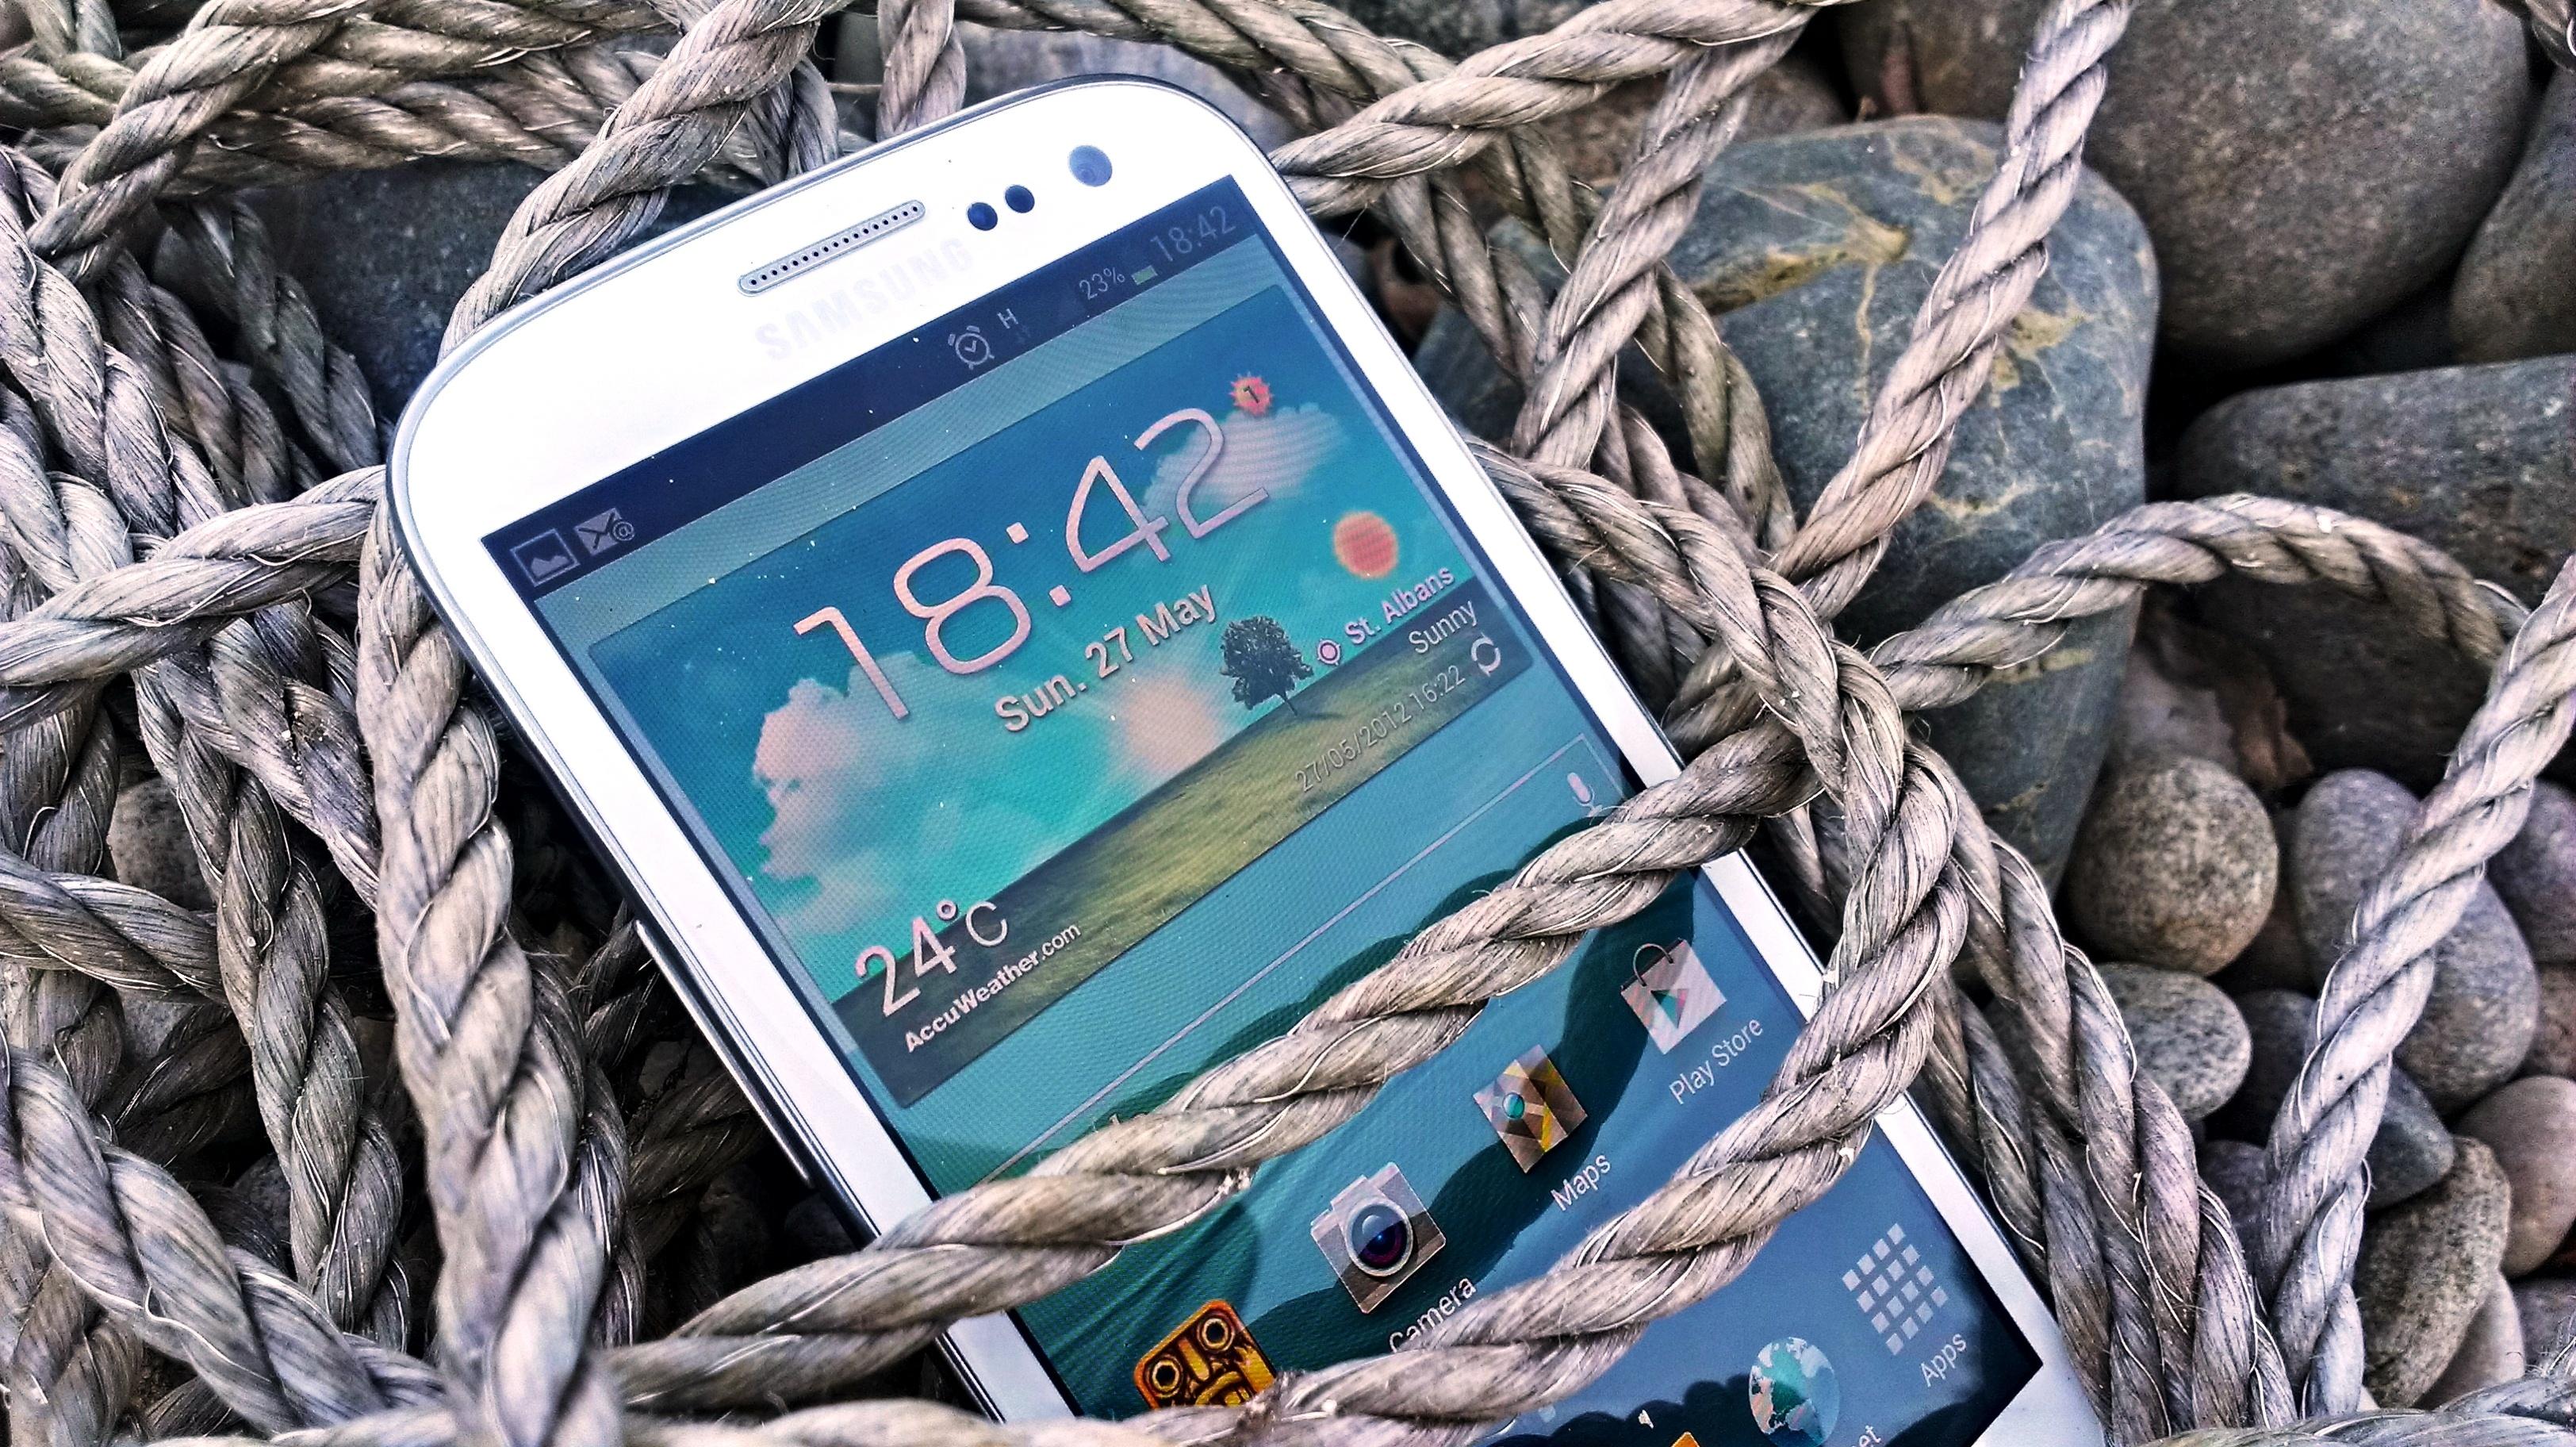 Killer code could wipe Samsung handsets | TechRadar